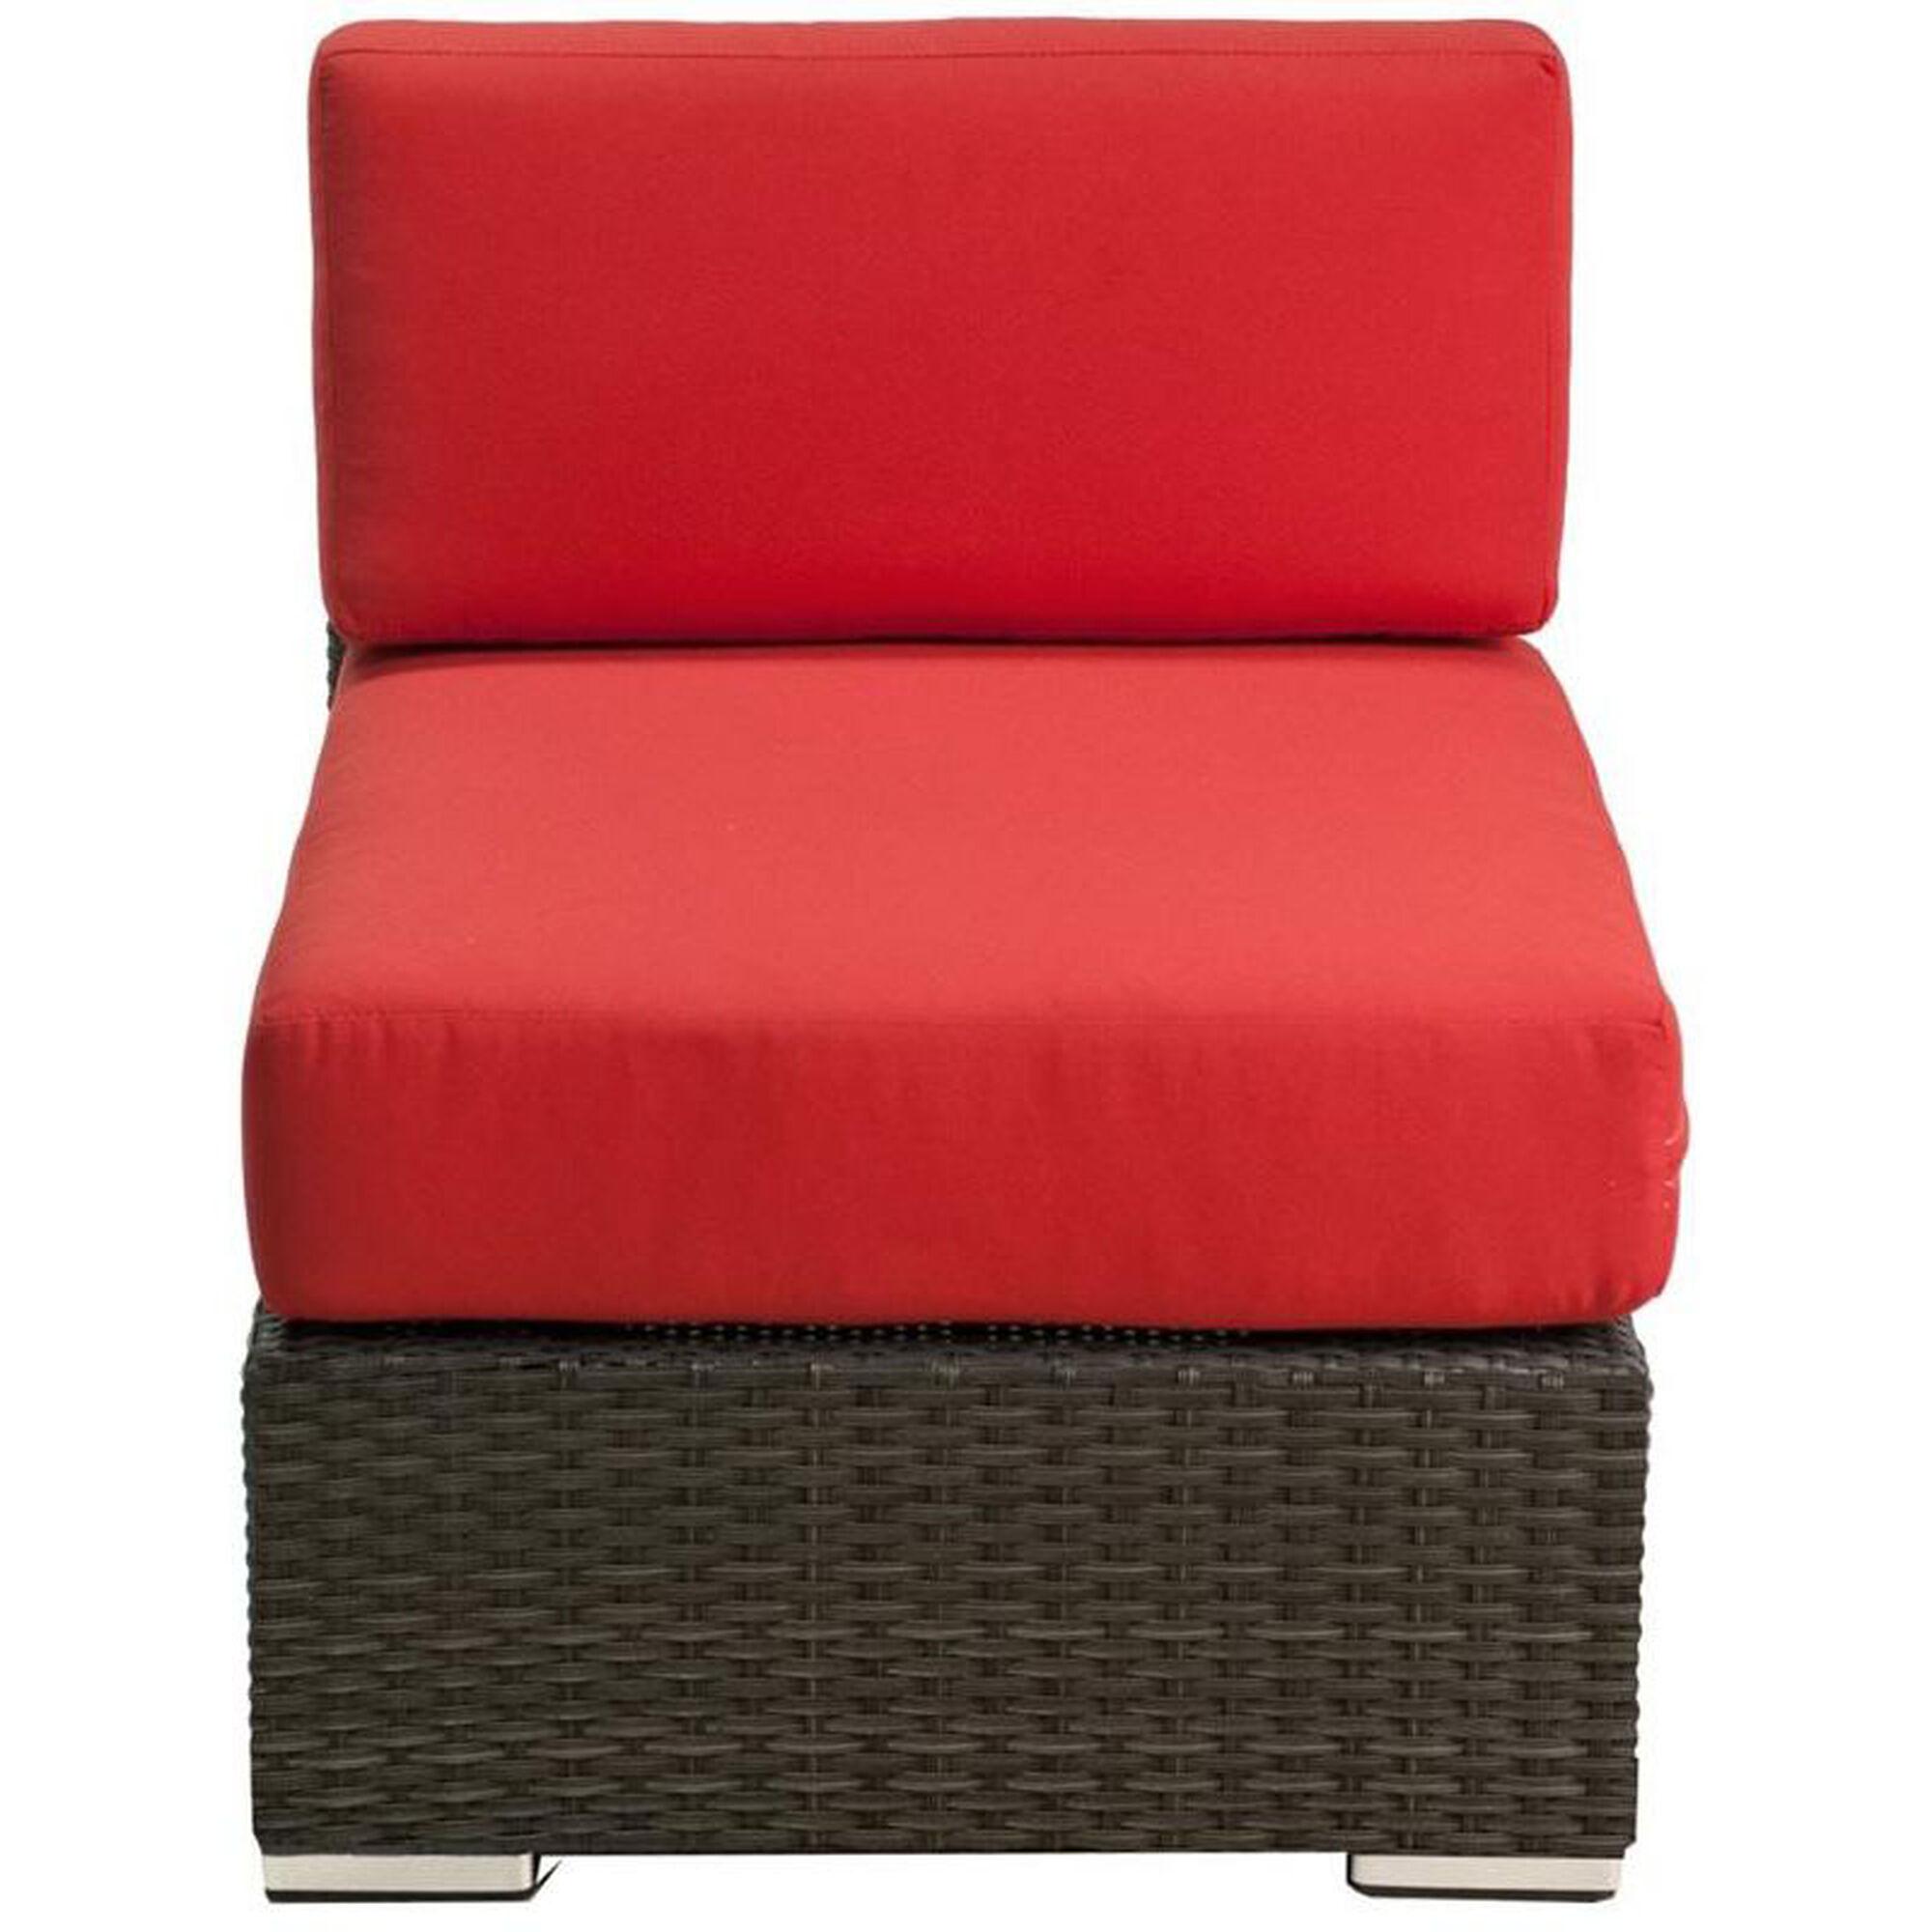 Outstanding Crystal Beach Collection Outdoor Wicker Side Chair With Sunbrella Cushions Indo Inzonedesignstudio Interior Chair Design Inzonedesignstudiocom